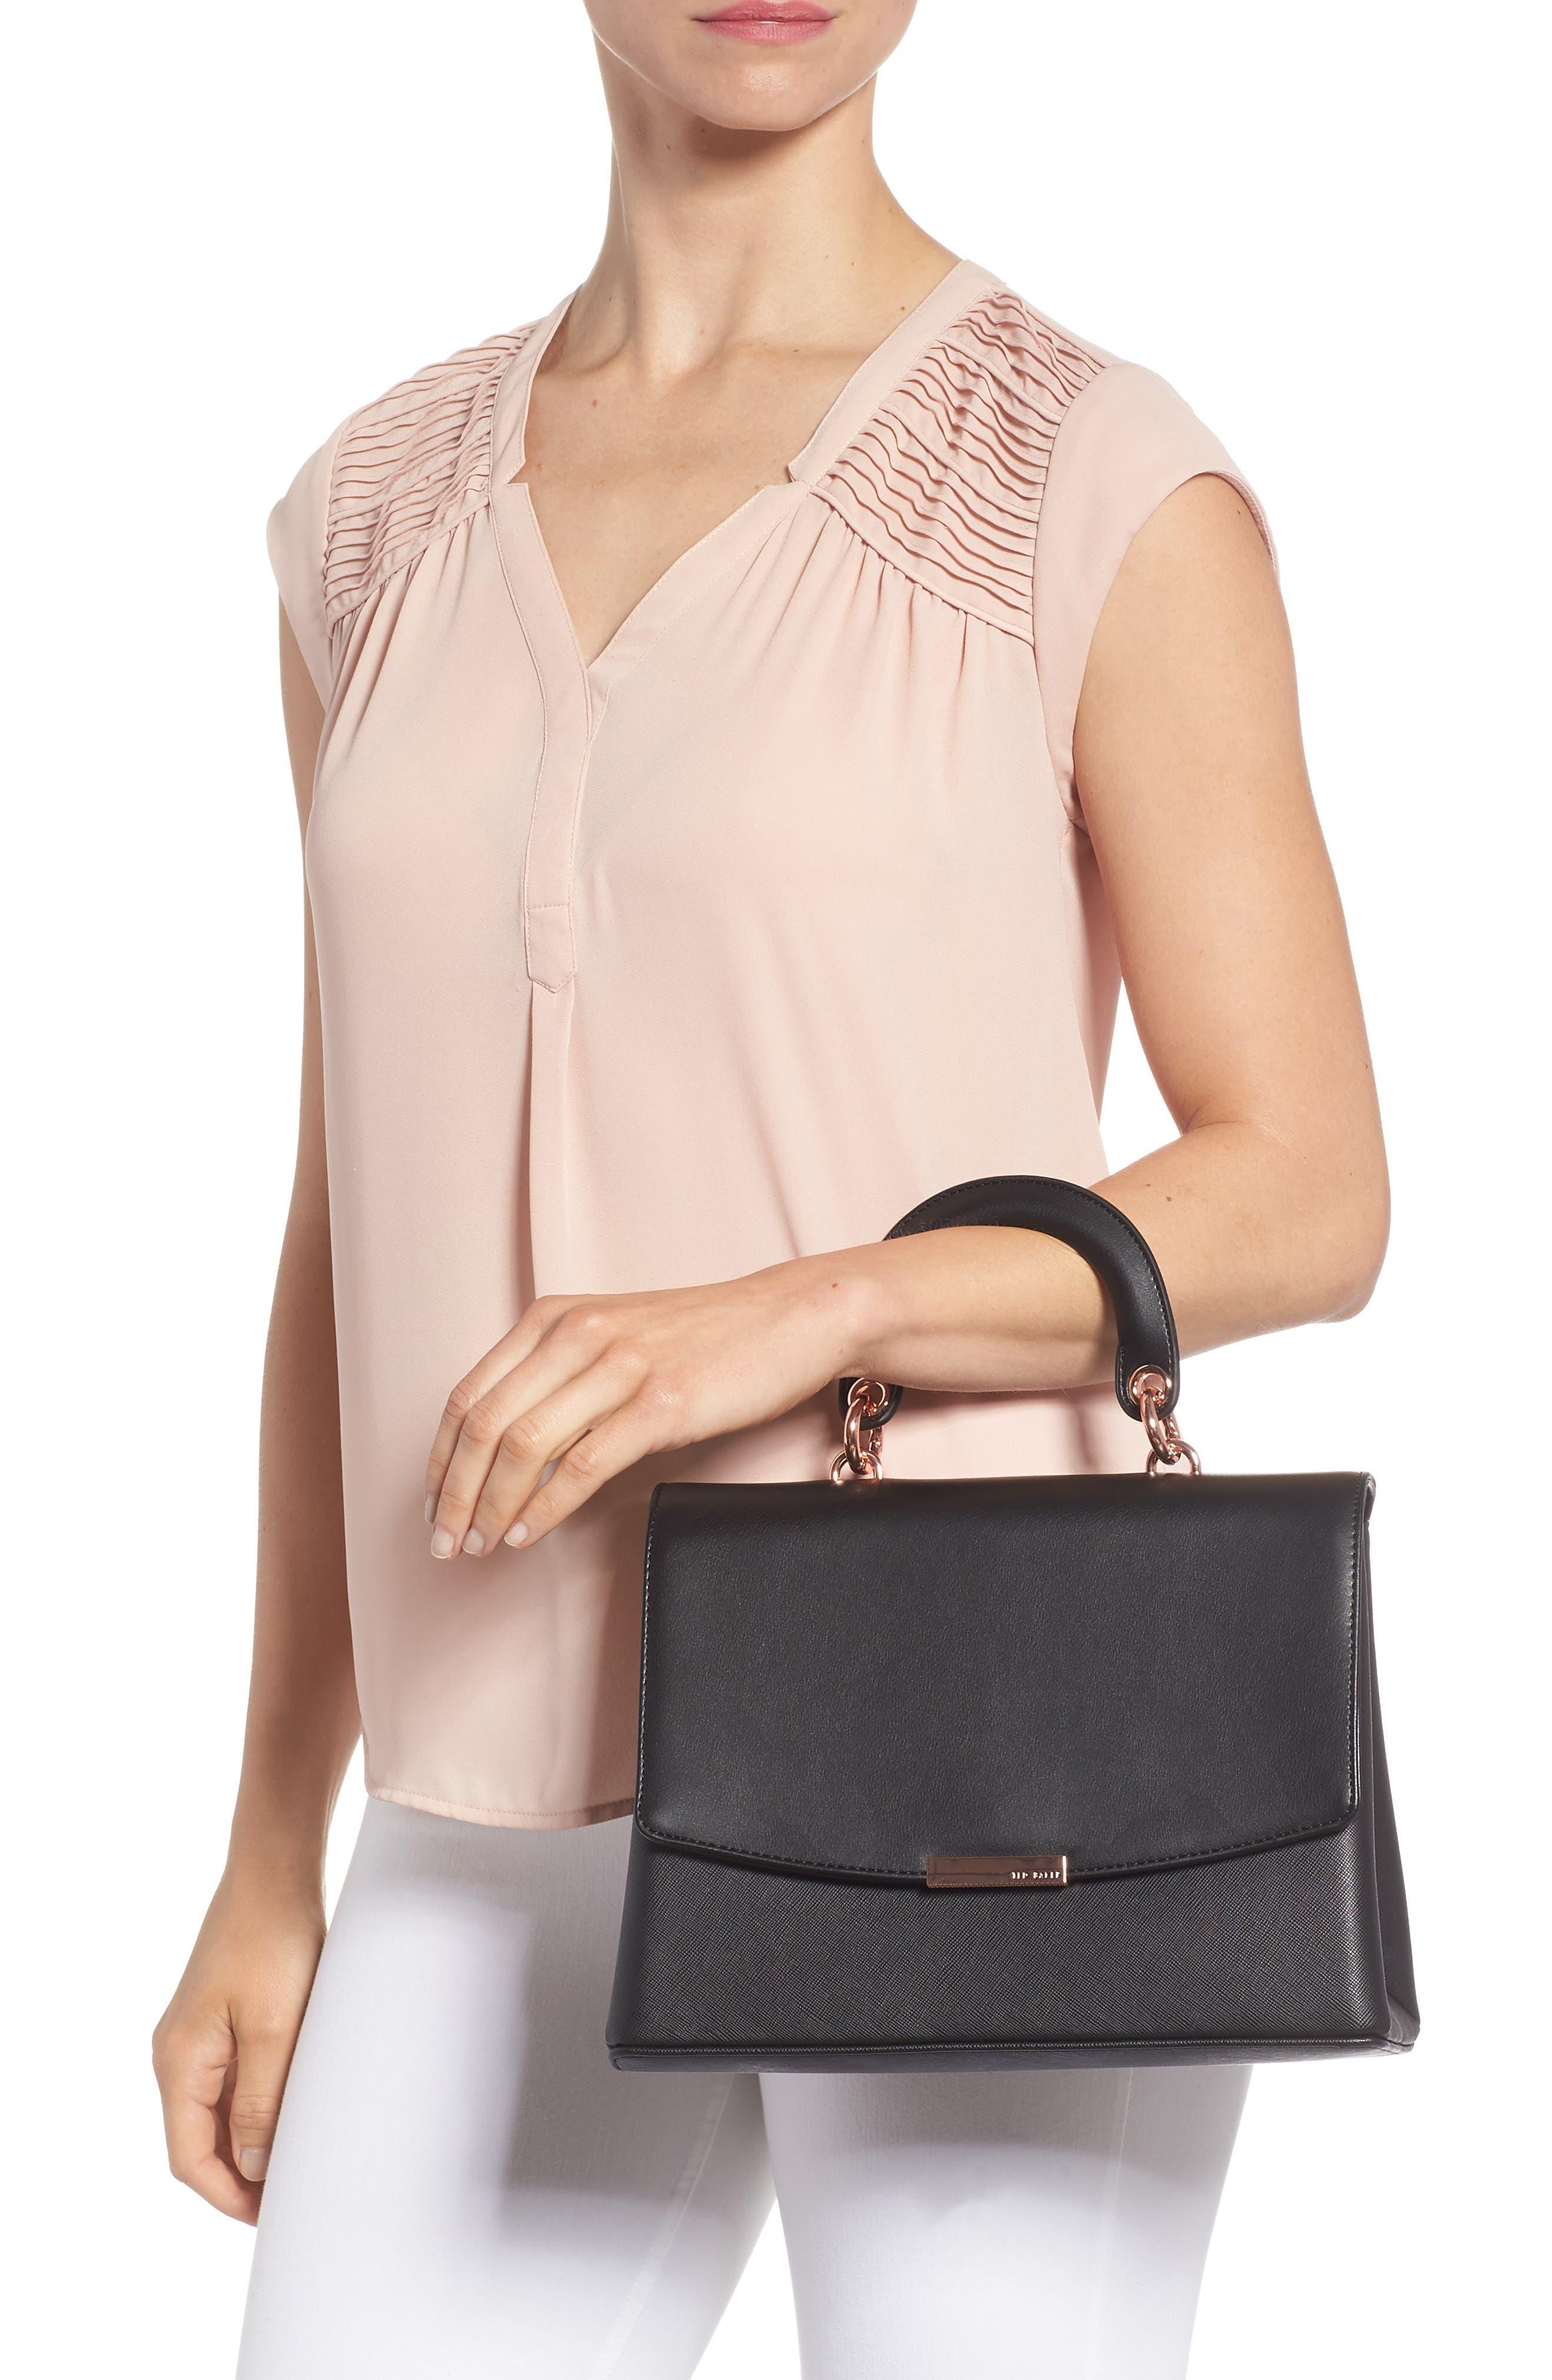 Keiira Lady Bag Faux Leather Top Handle Satchel,                             Alternate thumbnail 2, color,                             001